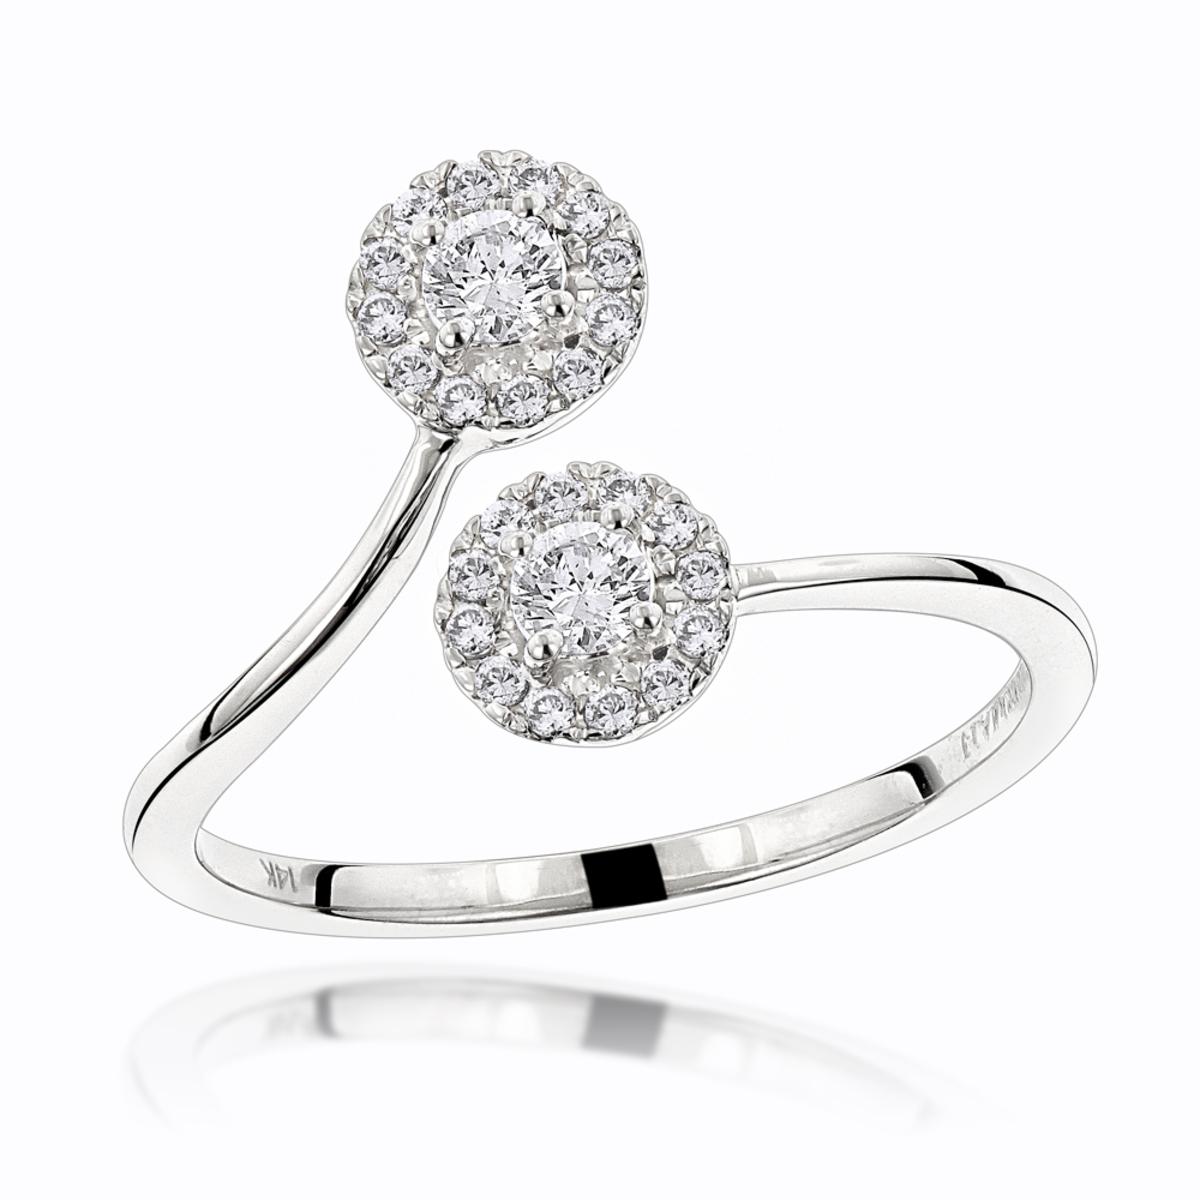 Luxurman Love & Friendship Rings: 14K Gold 2 Stone Diamond Halo Ring 0.33ct